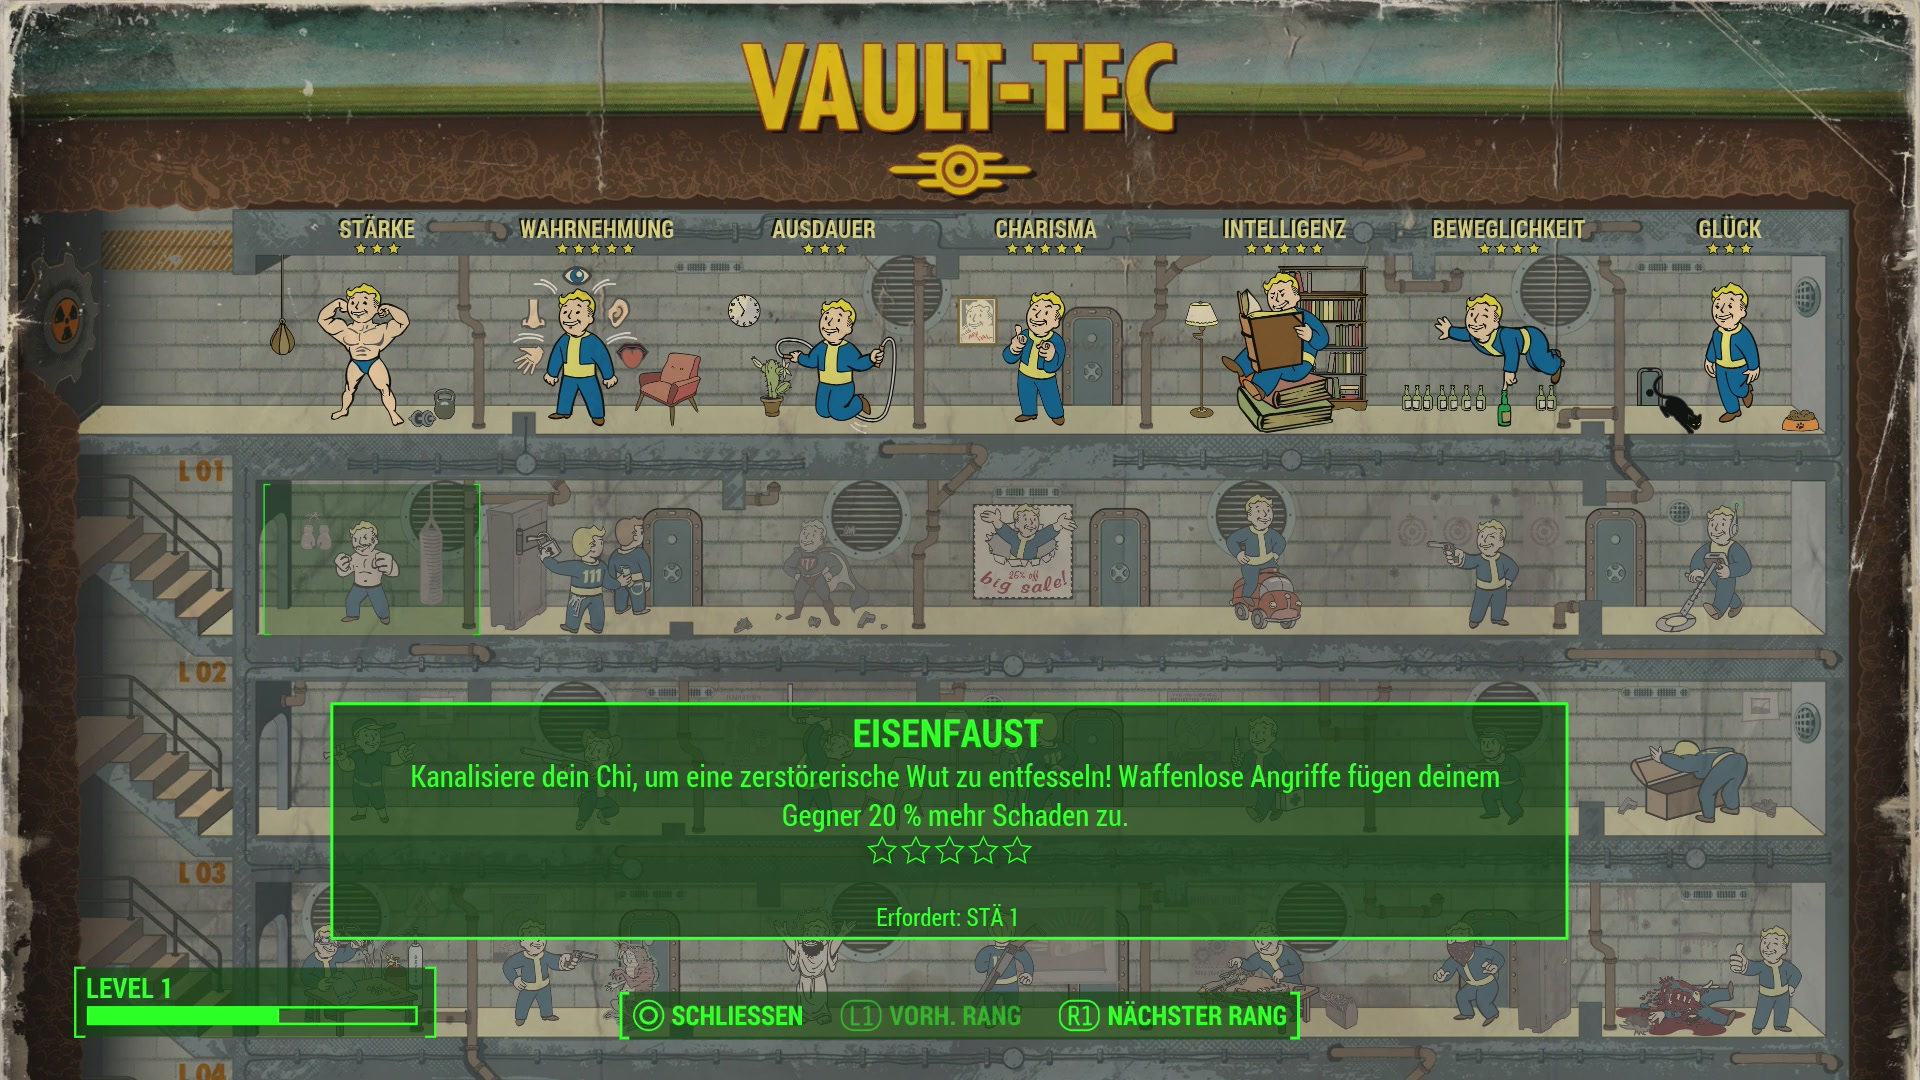 Fallout 4 Alle Skills Im Uberblick Guide Gamersglobal De